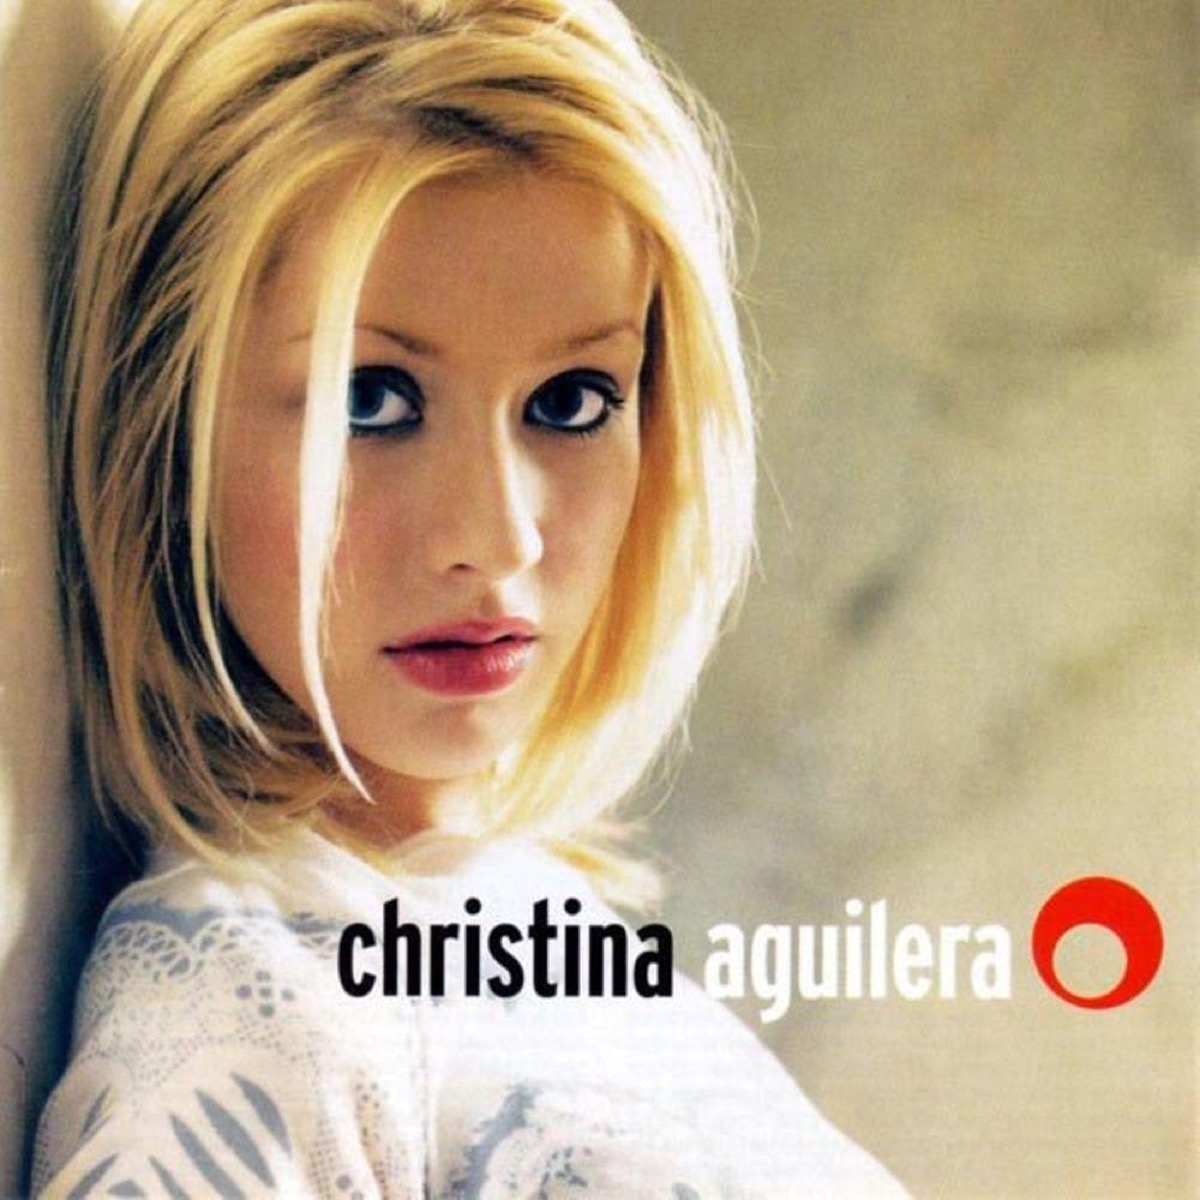 Christina Aguilera self-titled album cover